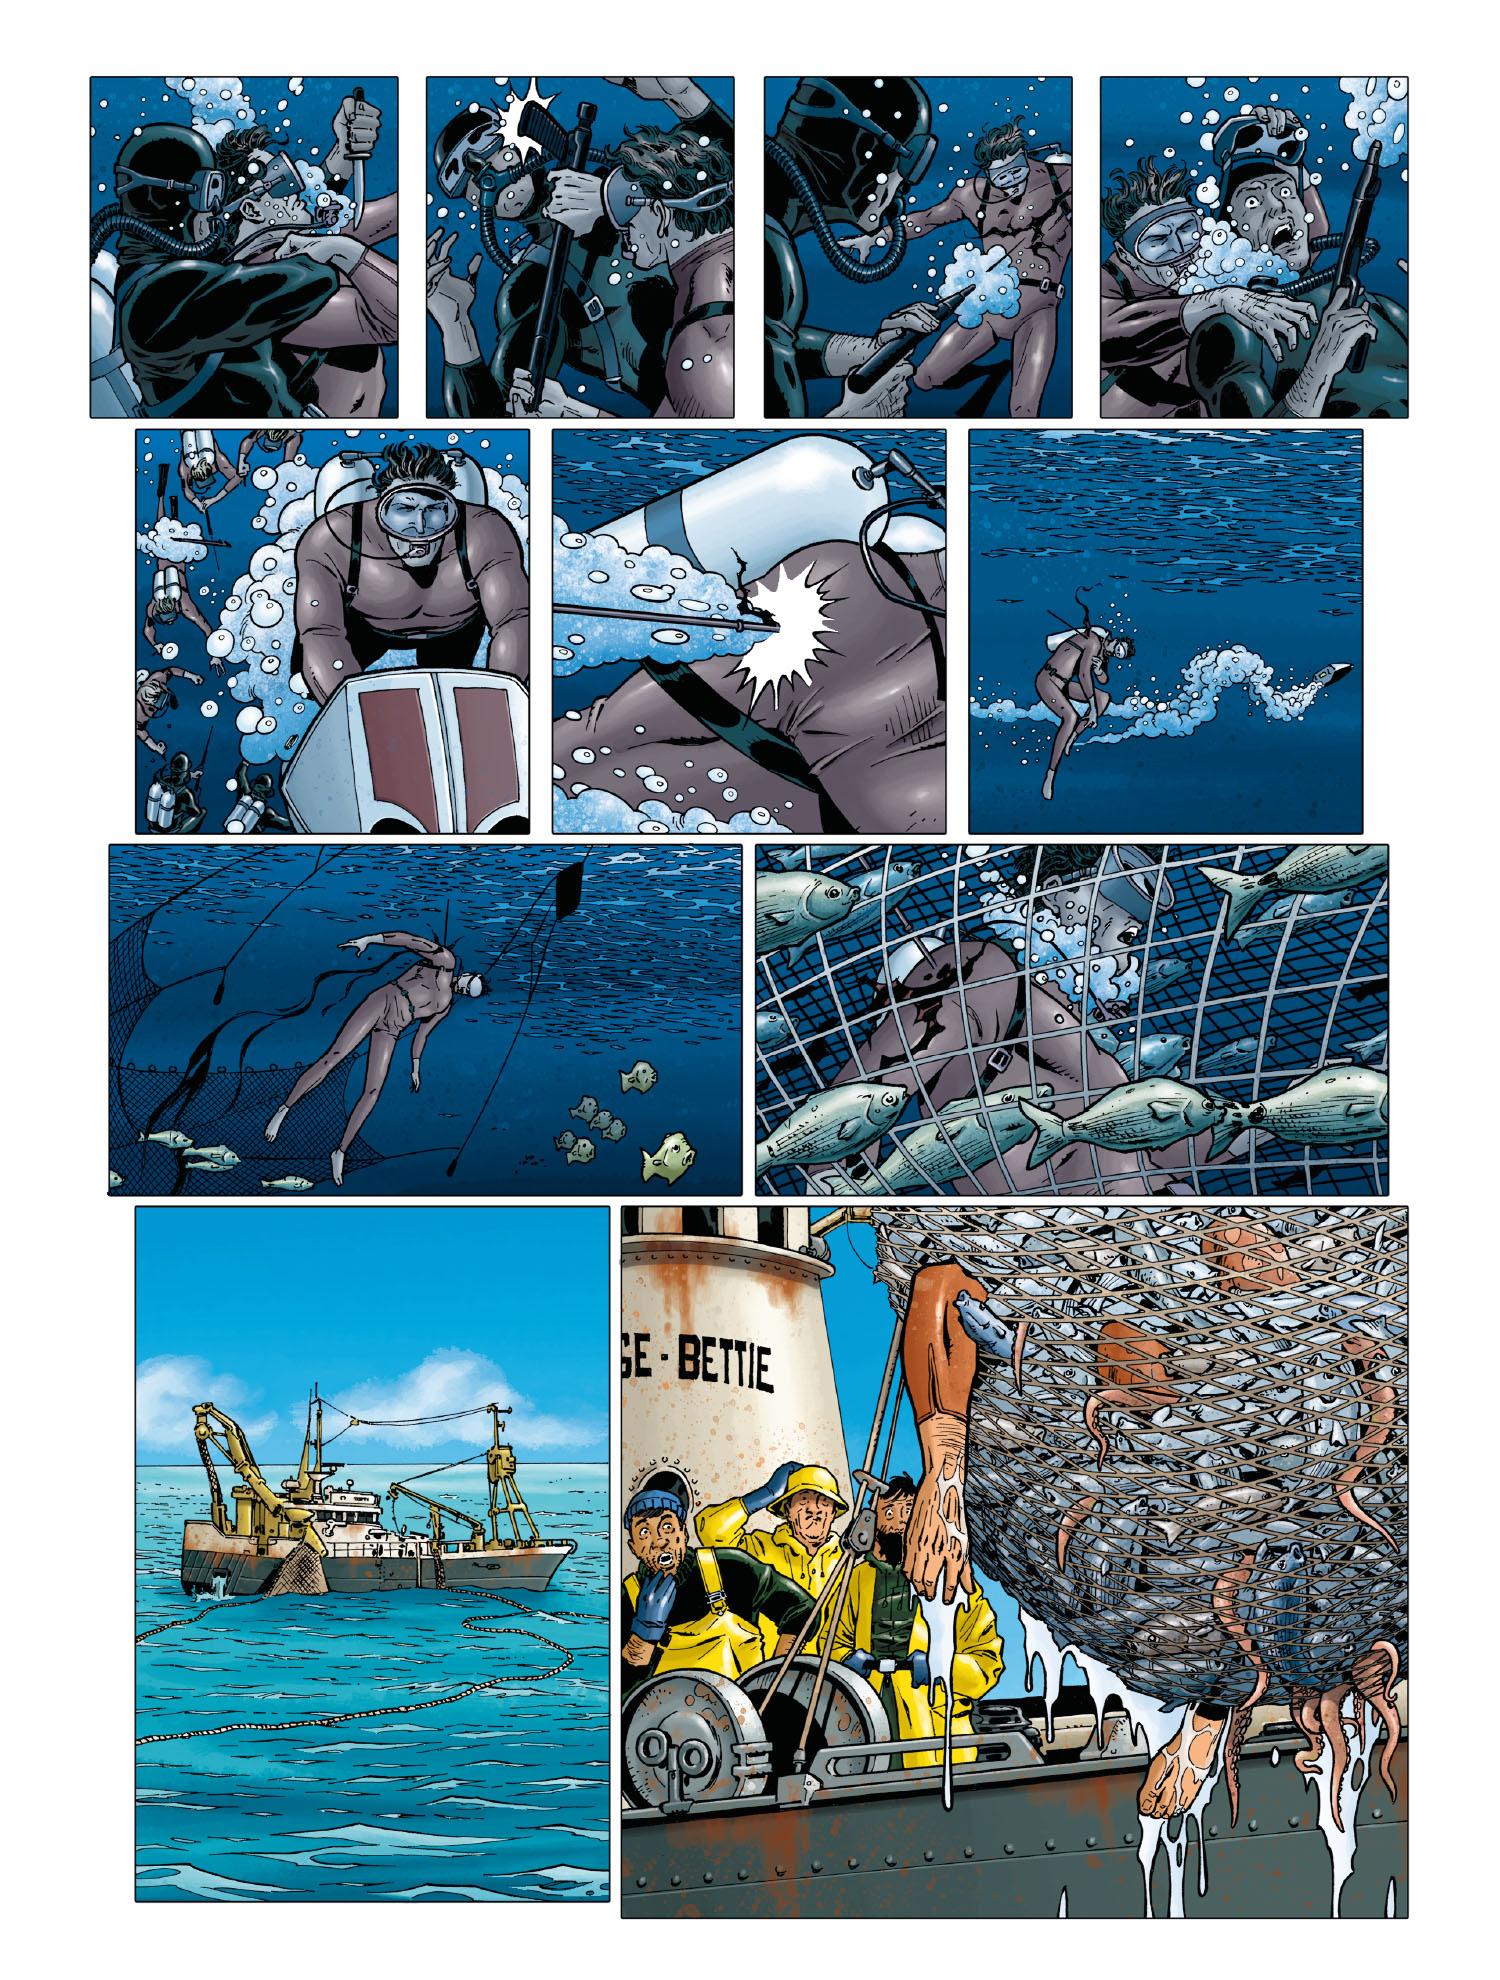 OSS 117, planche du tome 2 © Soleil / Cuneo / Gihef / Usagi